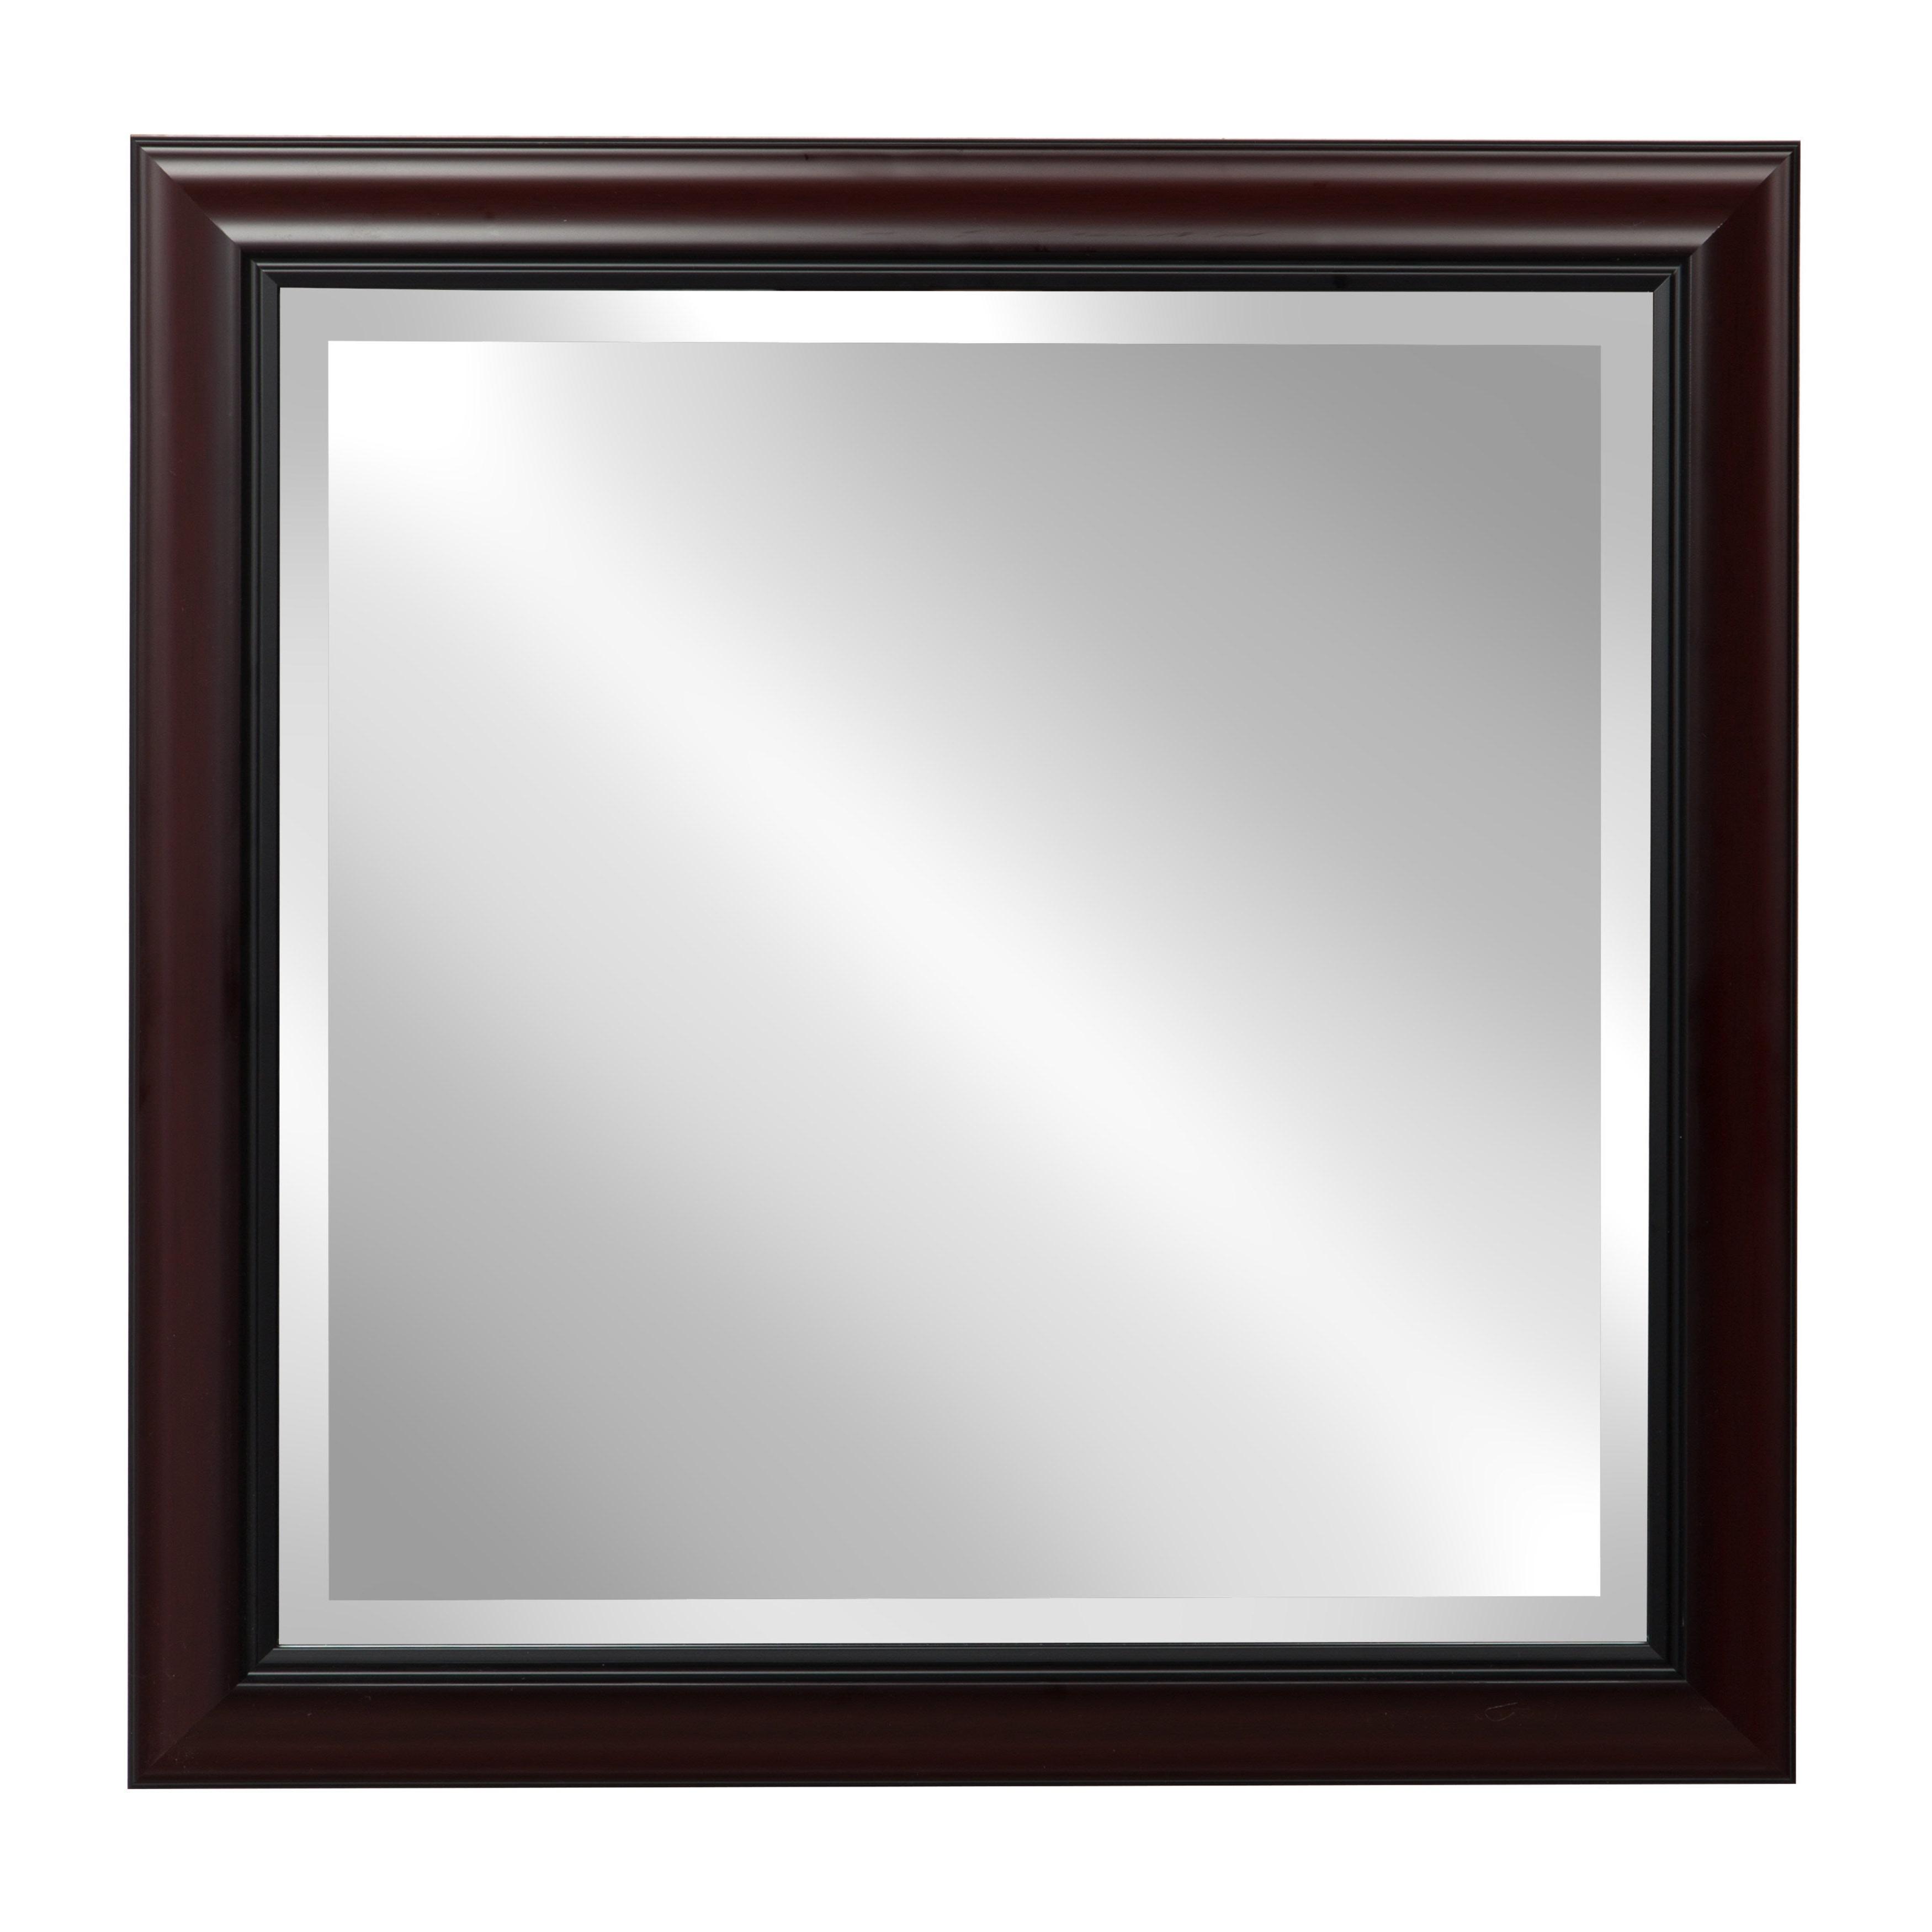 Current Designovation Dalat Cherry Framed Beveled Wall Mirror Regarding Cherry Wood Framed Wall Mirrors (View 6 of 20)